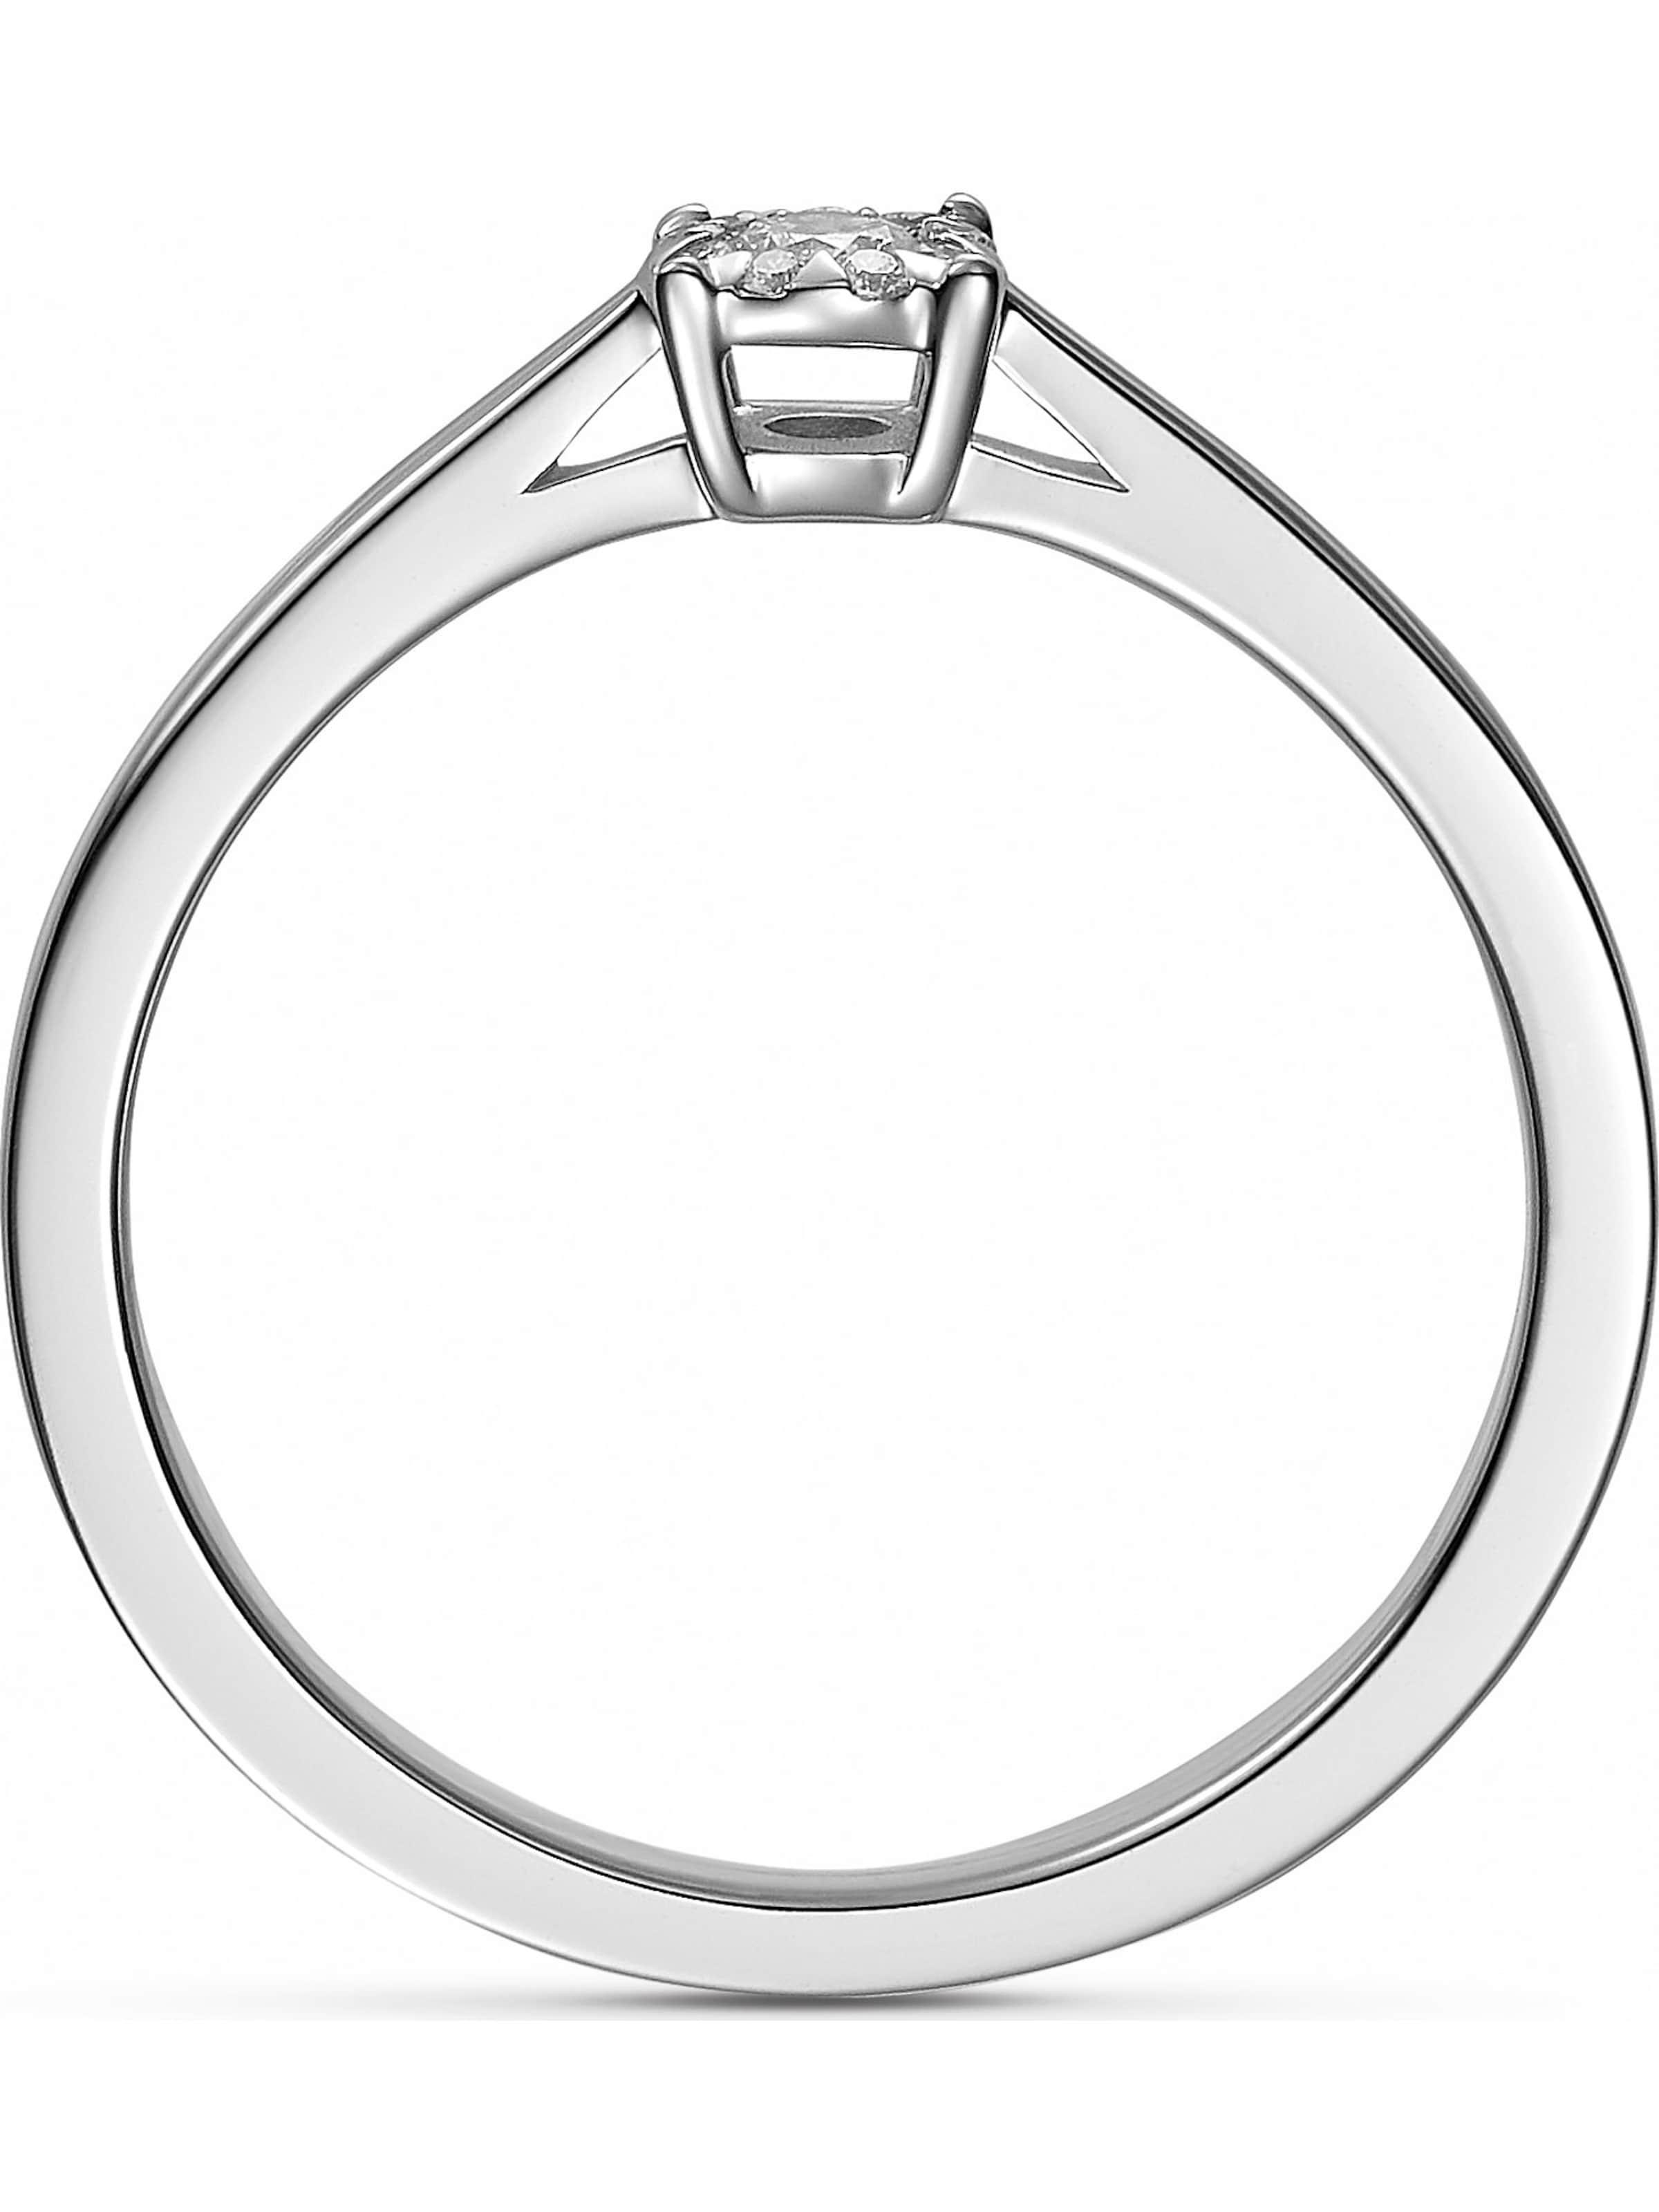 In Christ SilberTransparent SilberTransparent Christ Ring Christ Ring In Ring Christ In SilberTransparent Rq54Aj3L